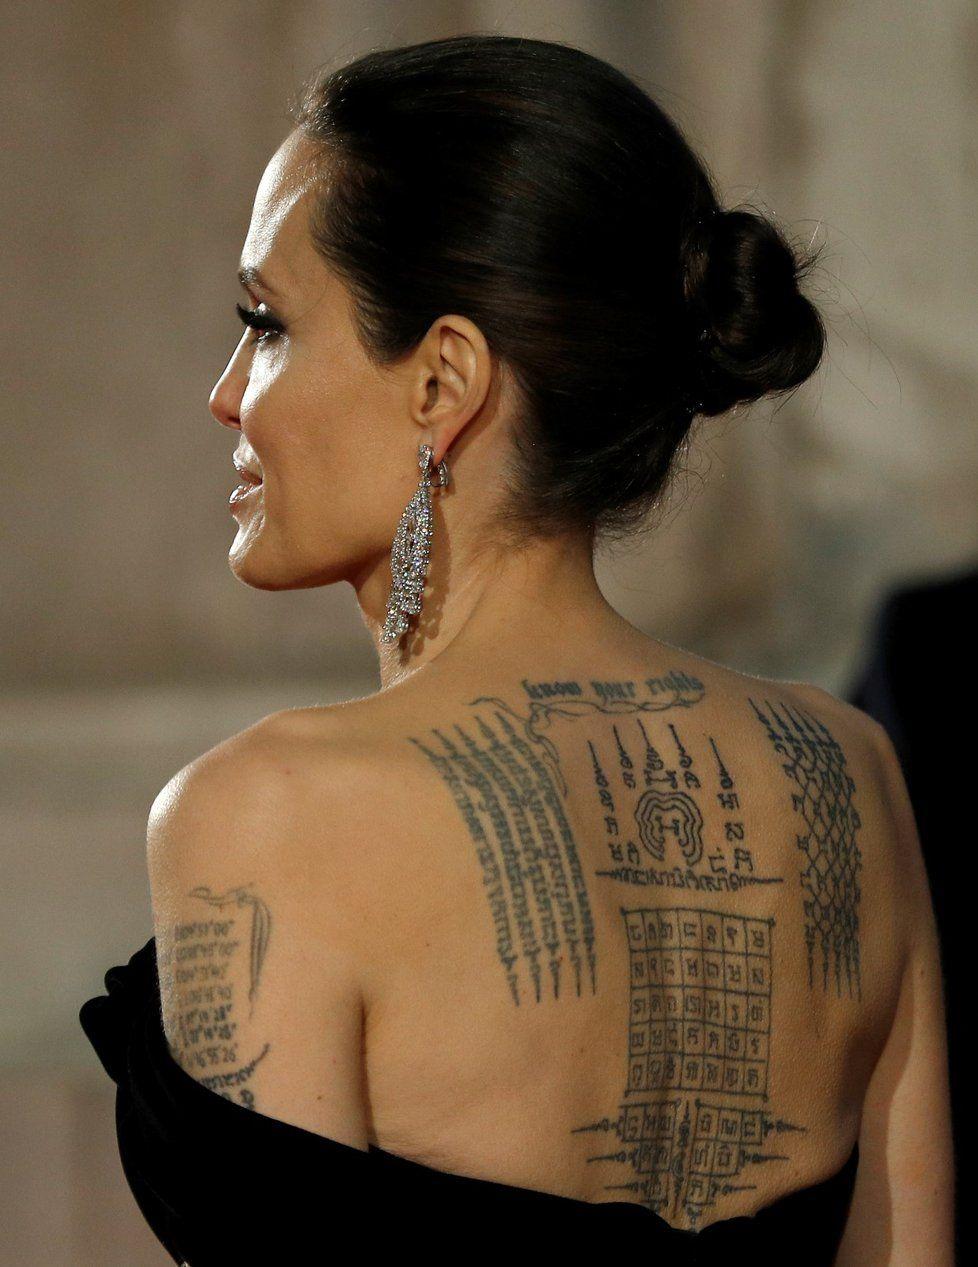 Angelina Jolie Tattoos в 2019 г Angelina Jolie Inked Girls и